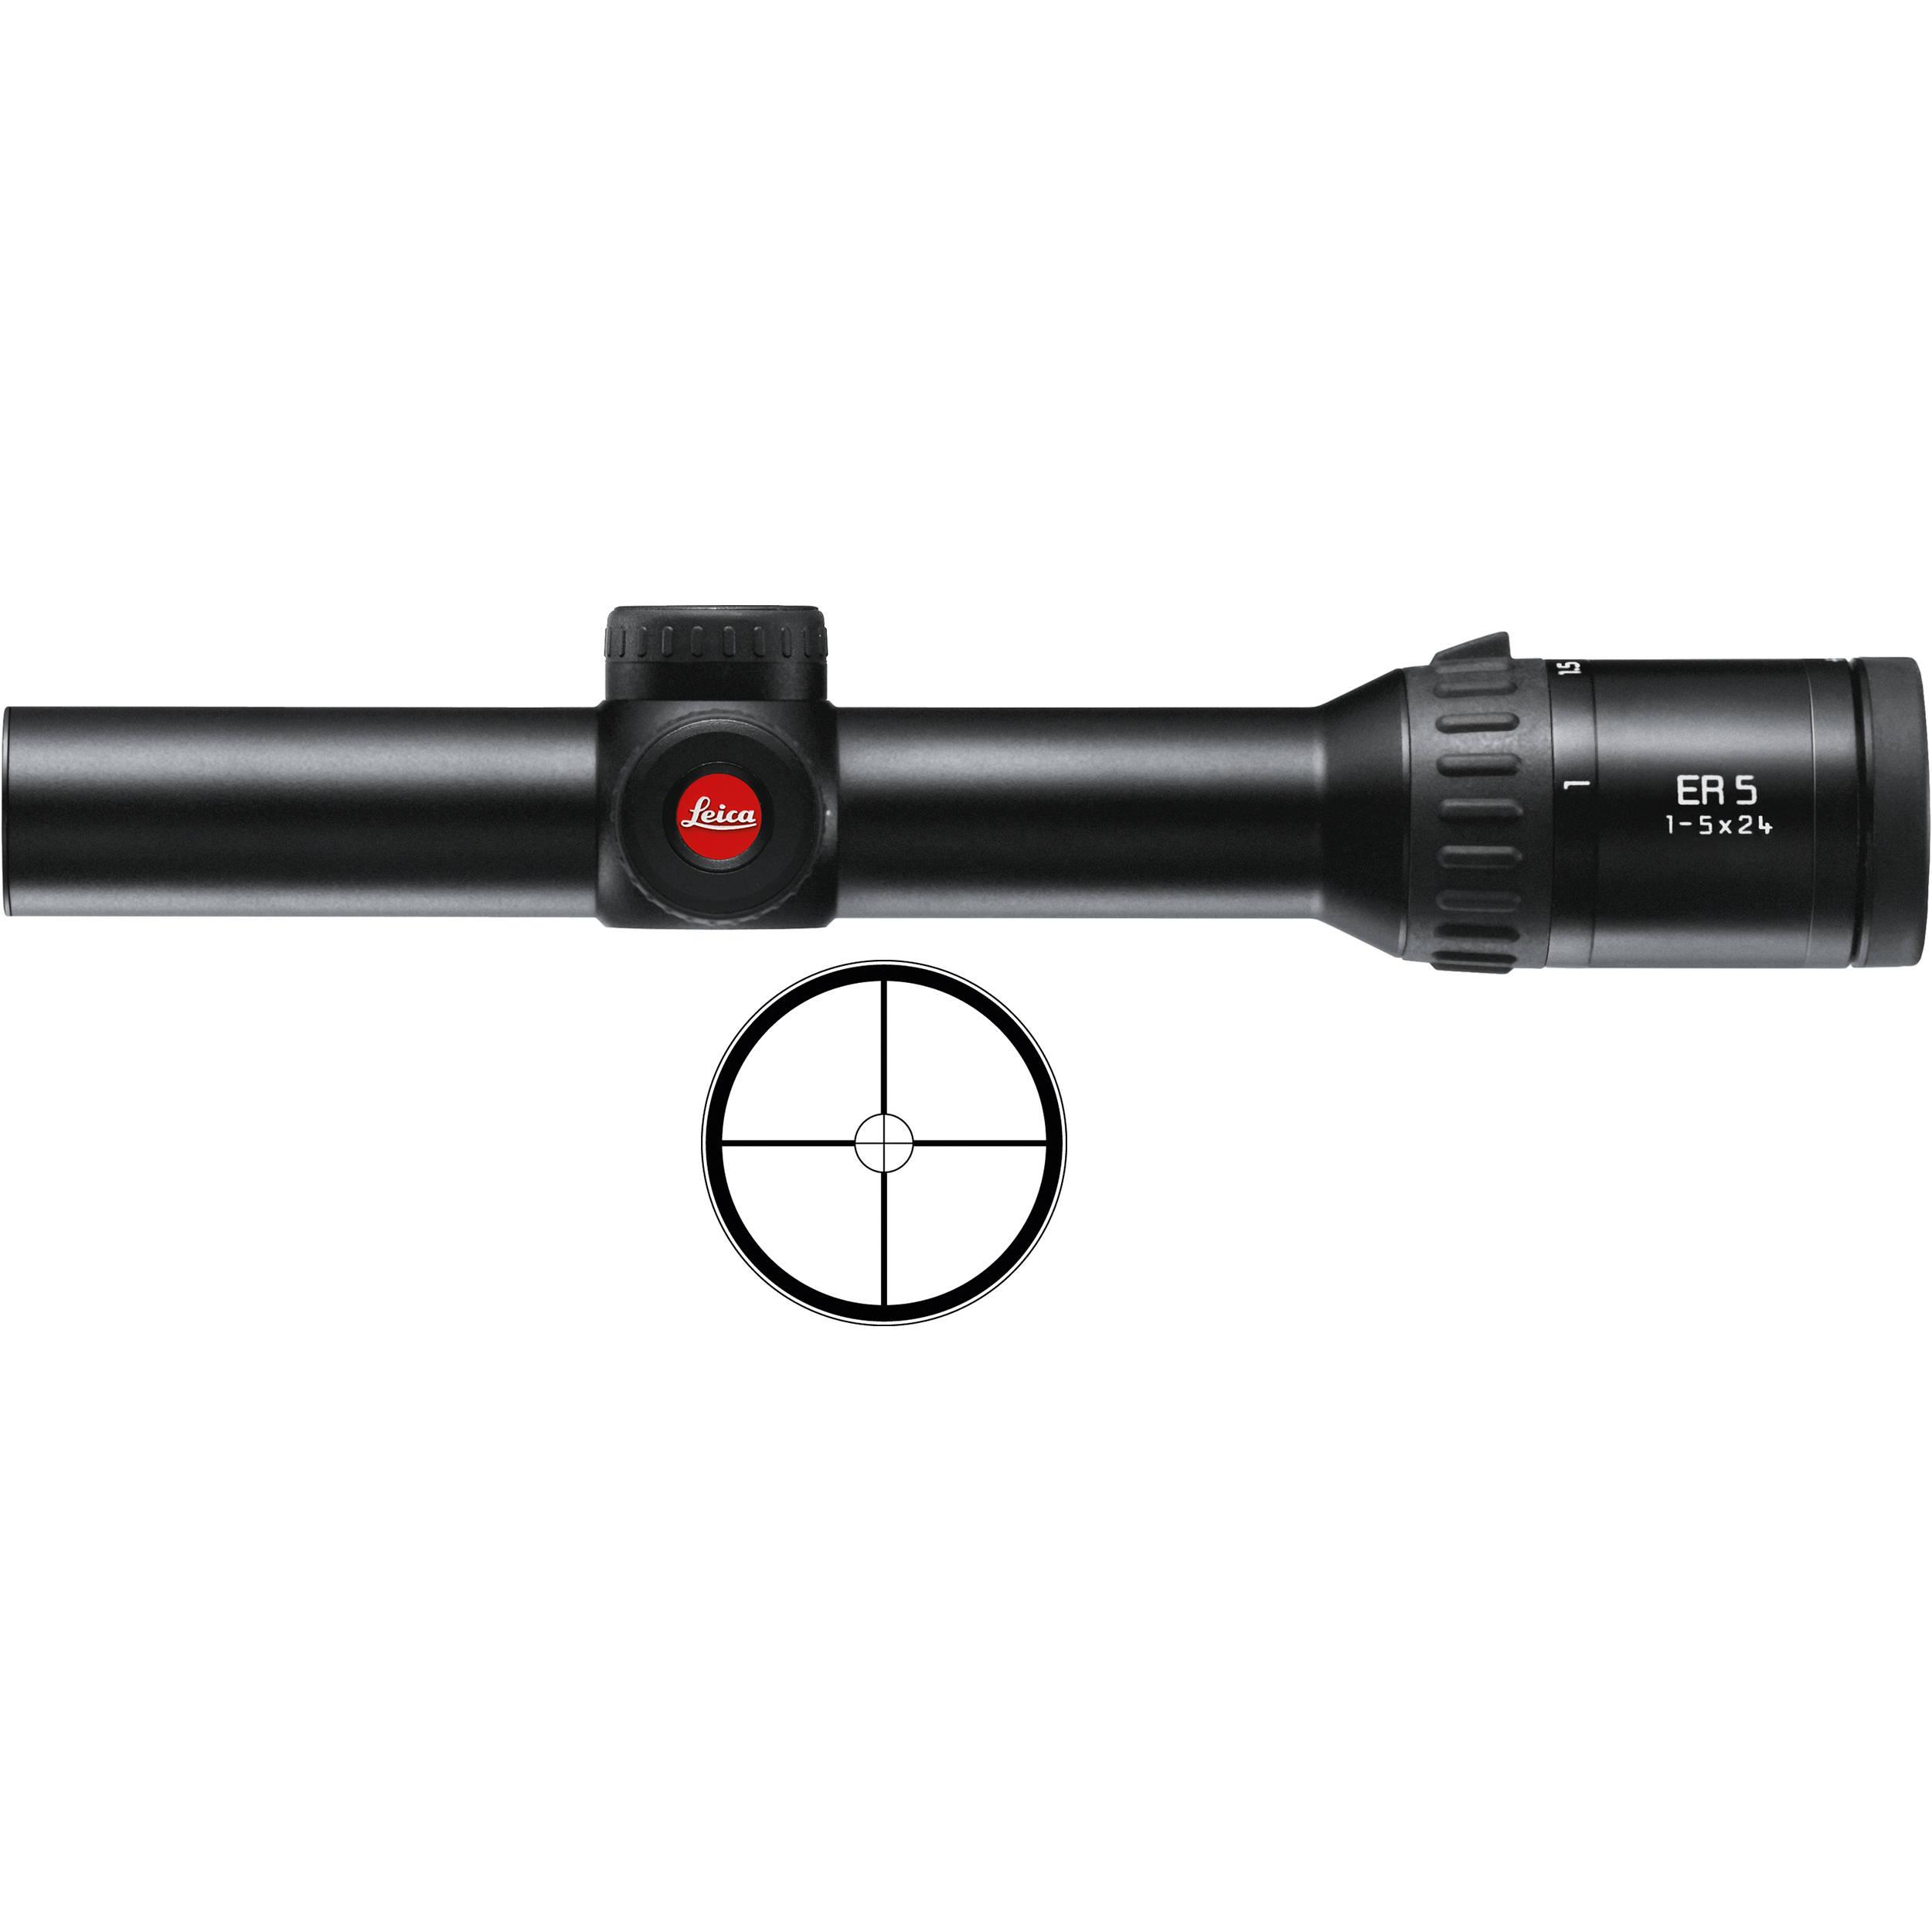 New Leica ER 5 riflescopes at Shot Show ? - 24hourcampfire